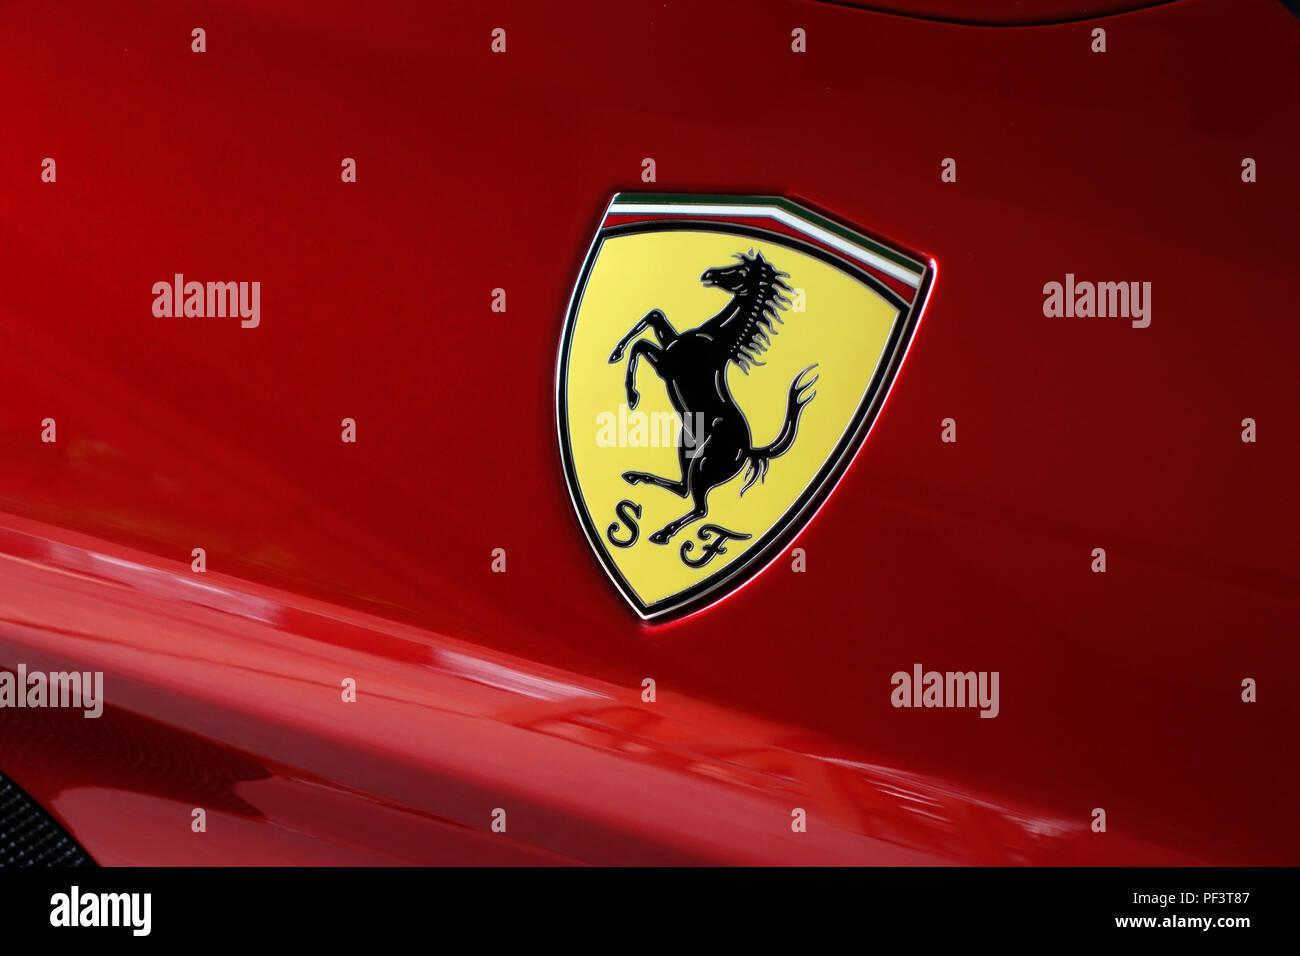 The Ferrari Shield Badge with prancing horse logo on Ferrari California T 2015 car Stock Photo